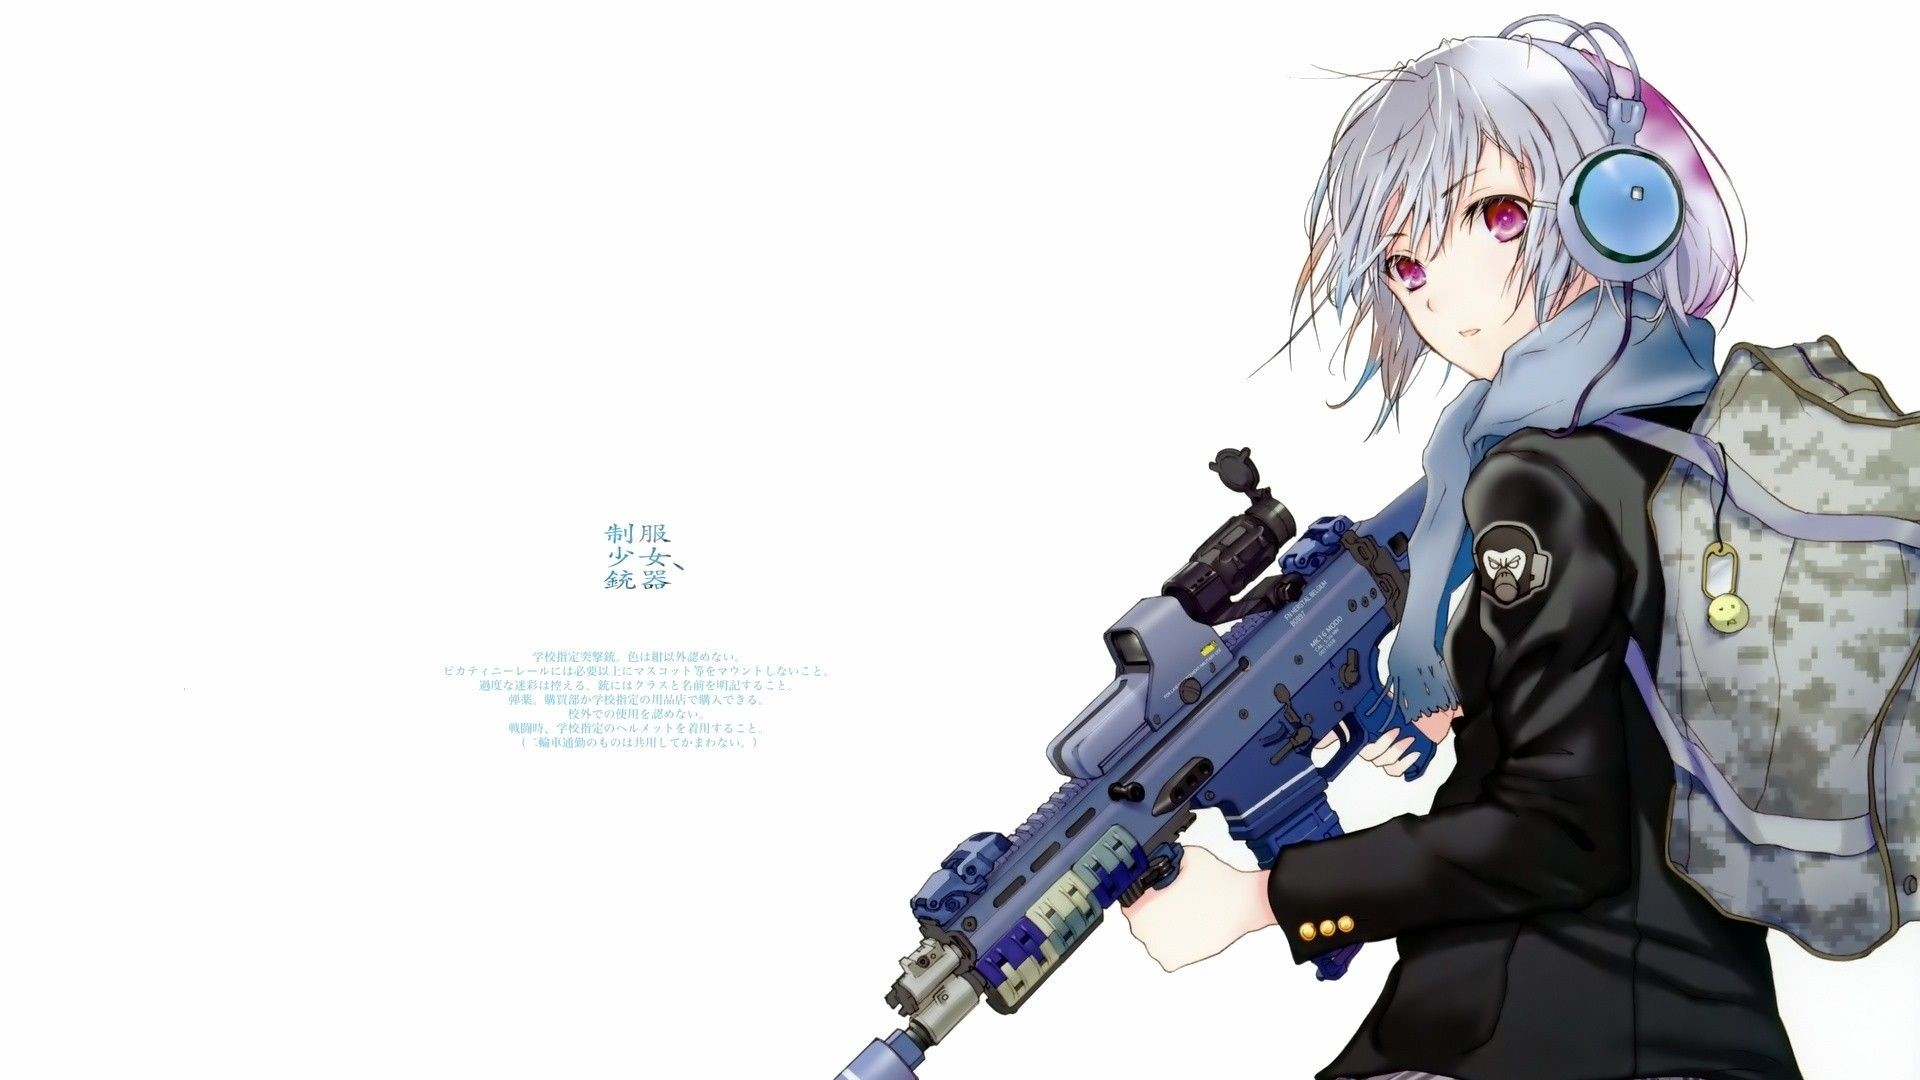 Cool Anime Wallpaper